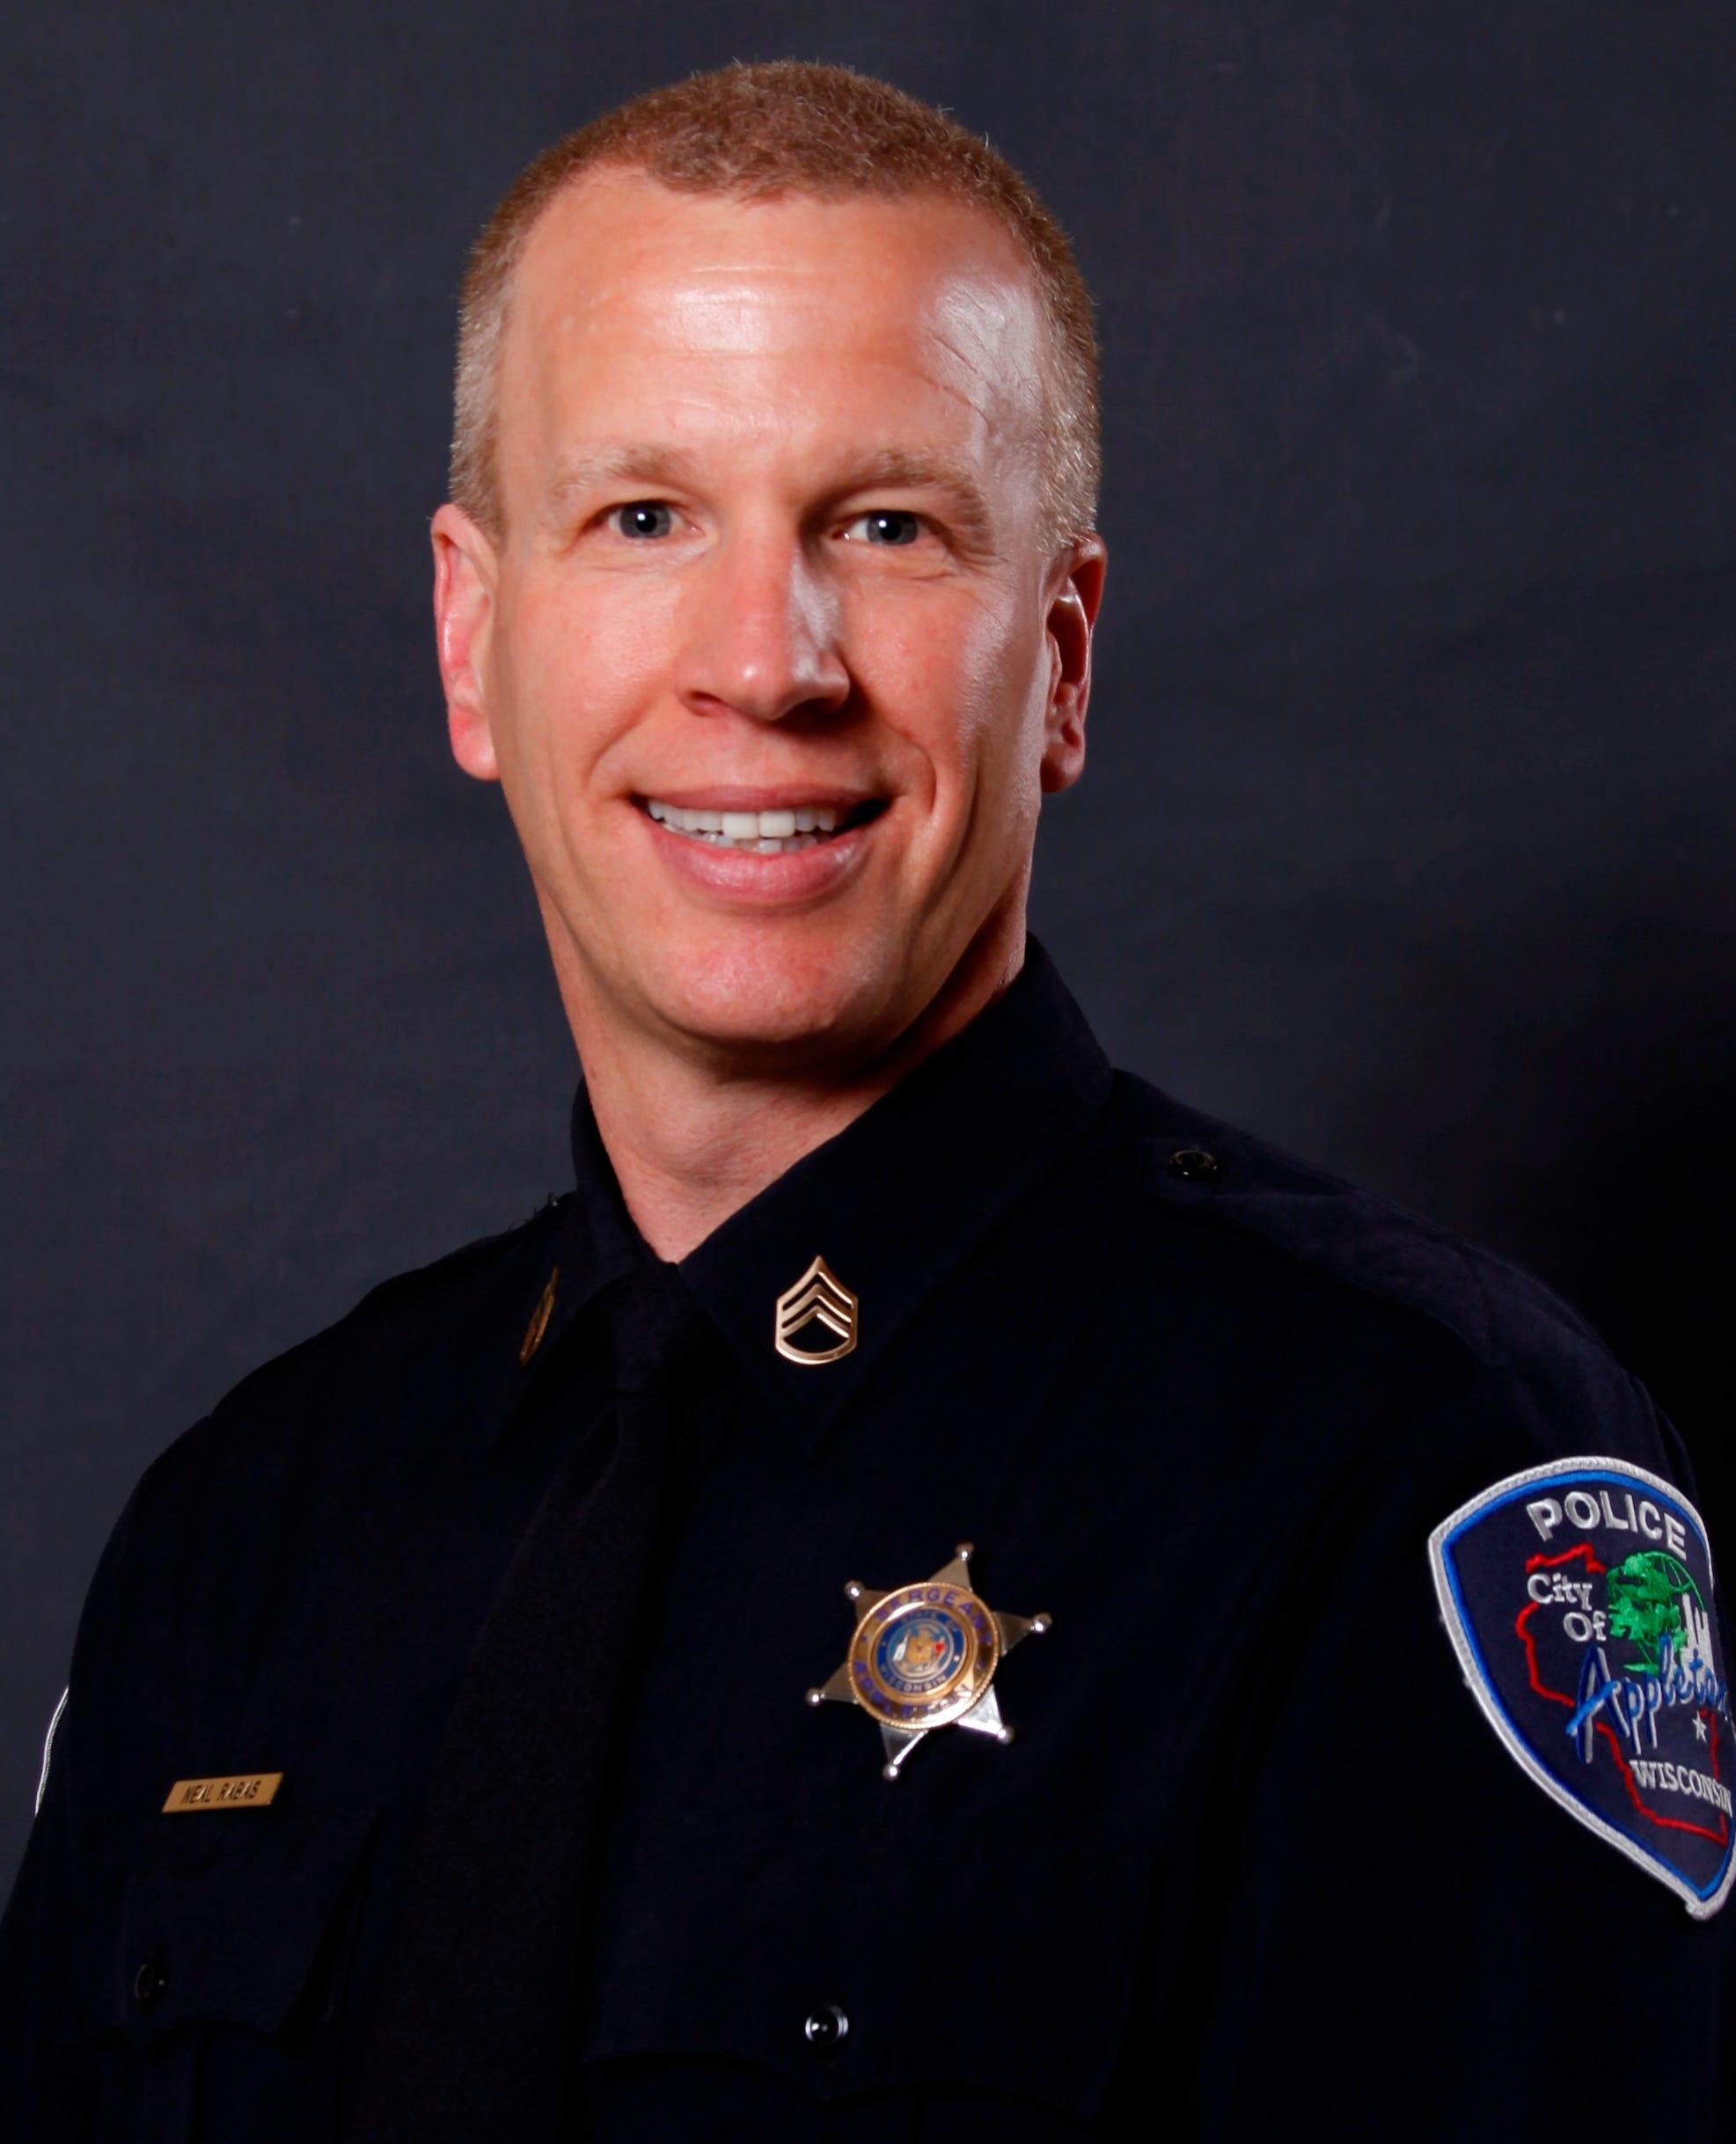 Sgt. Neal Rabas